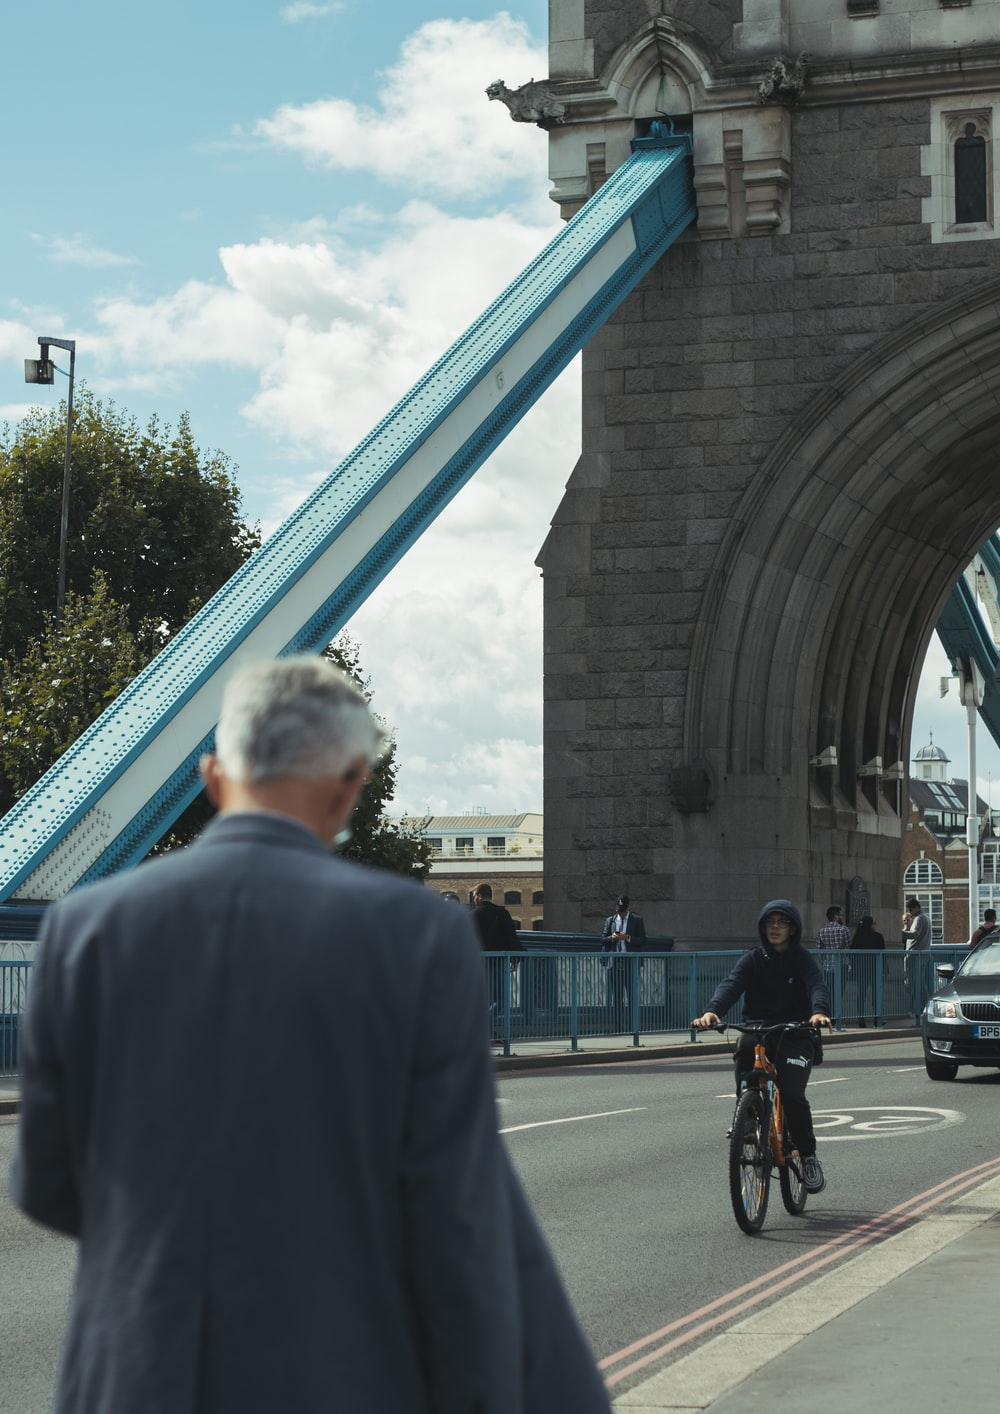 person biking on road during daytime